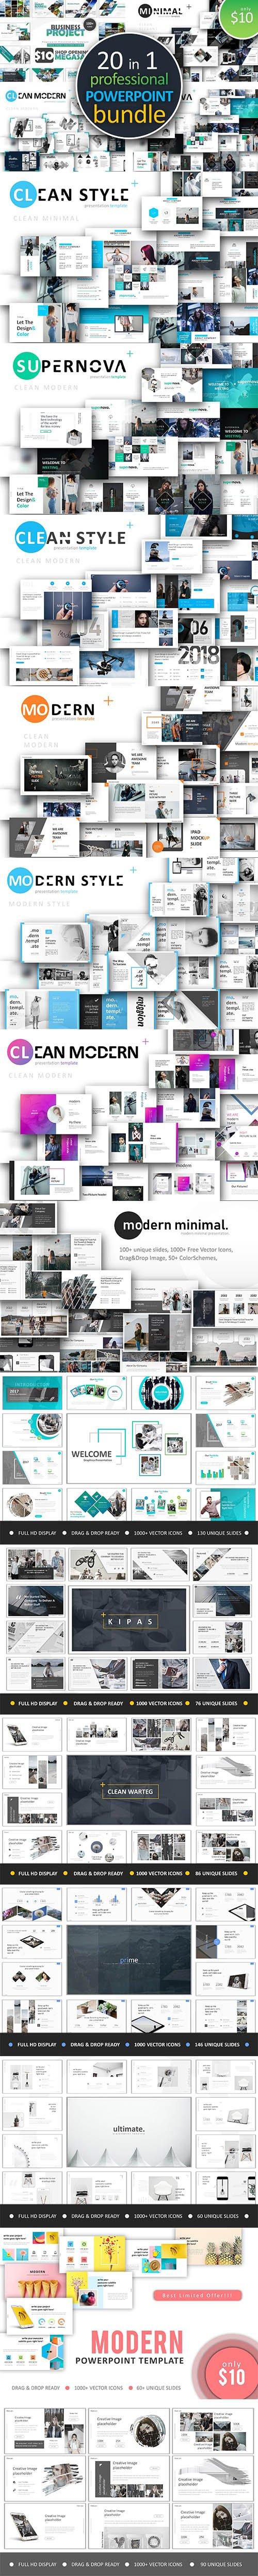 CreativeMarket - 20 in 1 Powerpoint Bundle